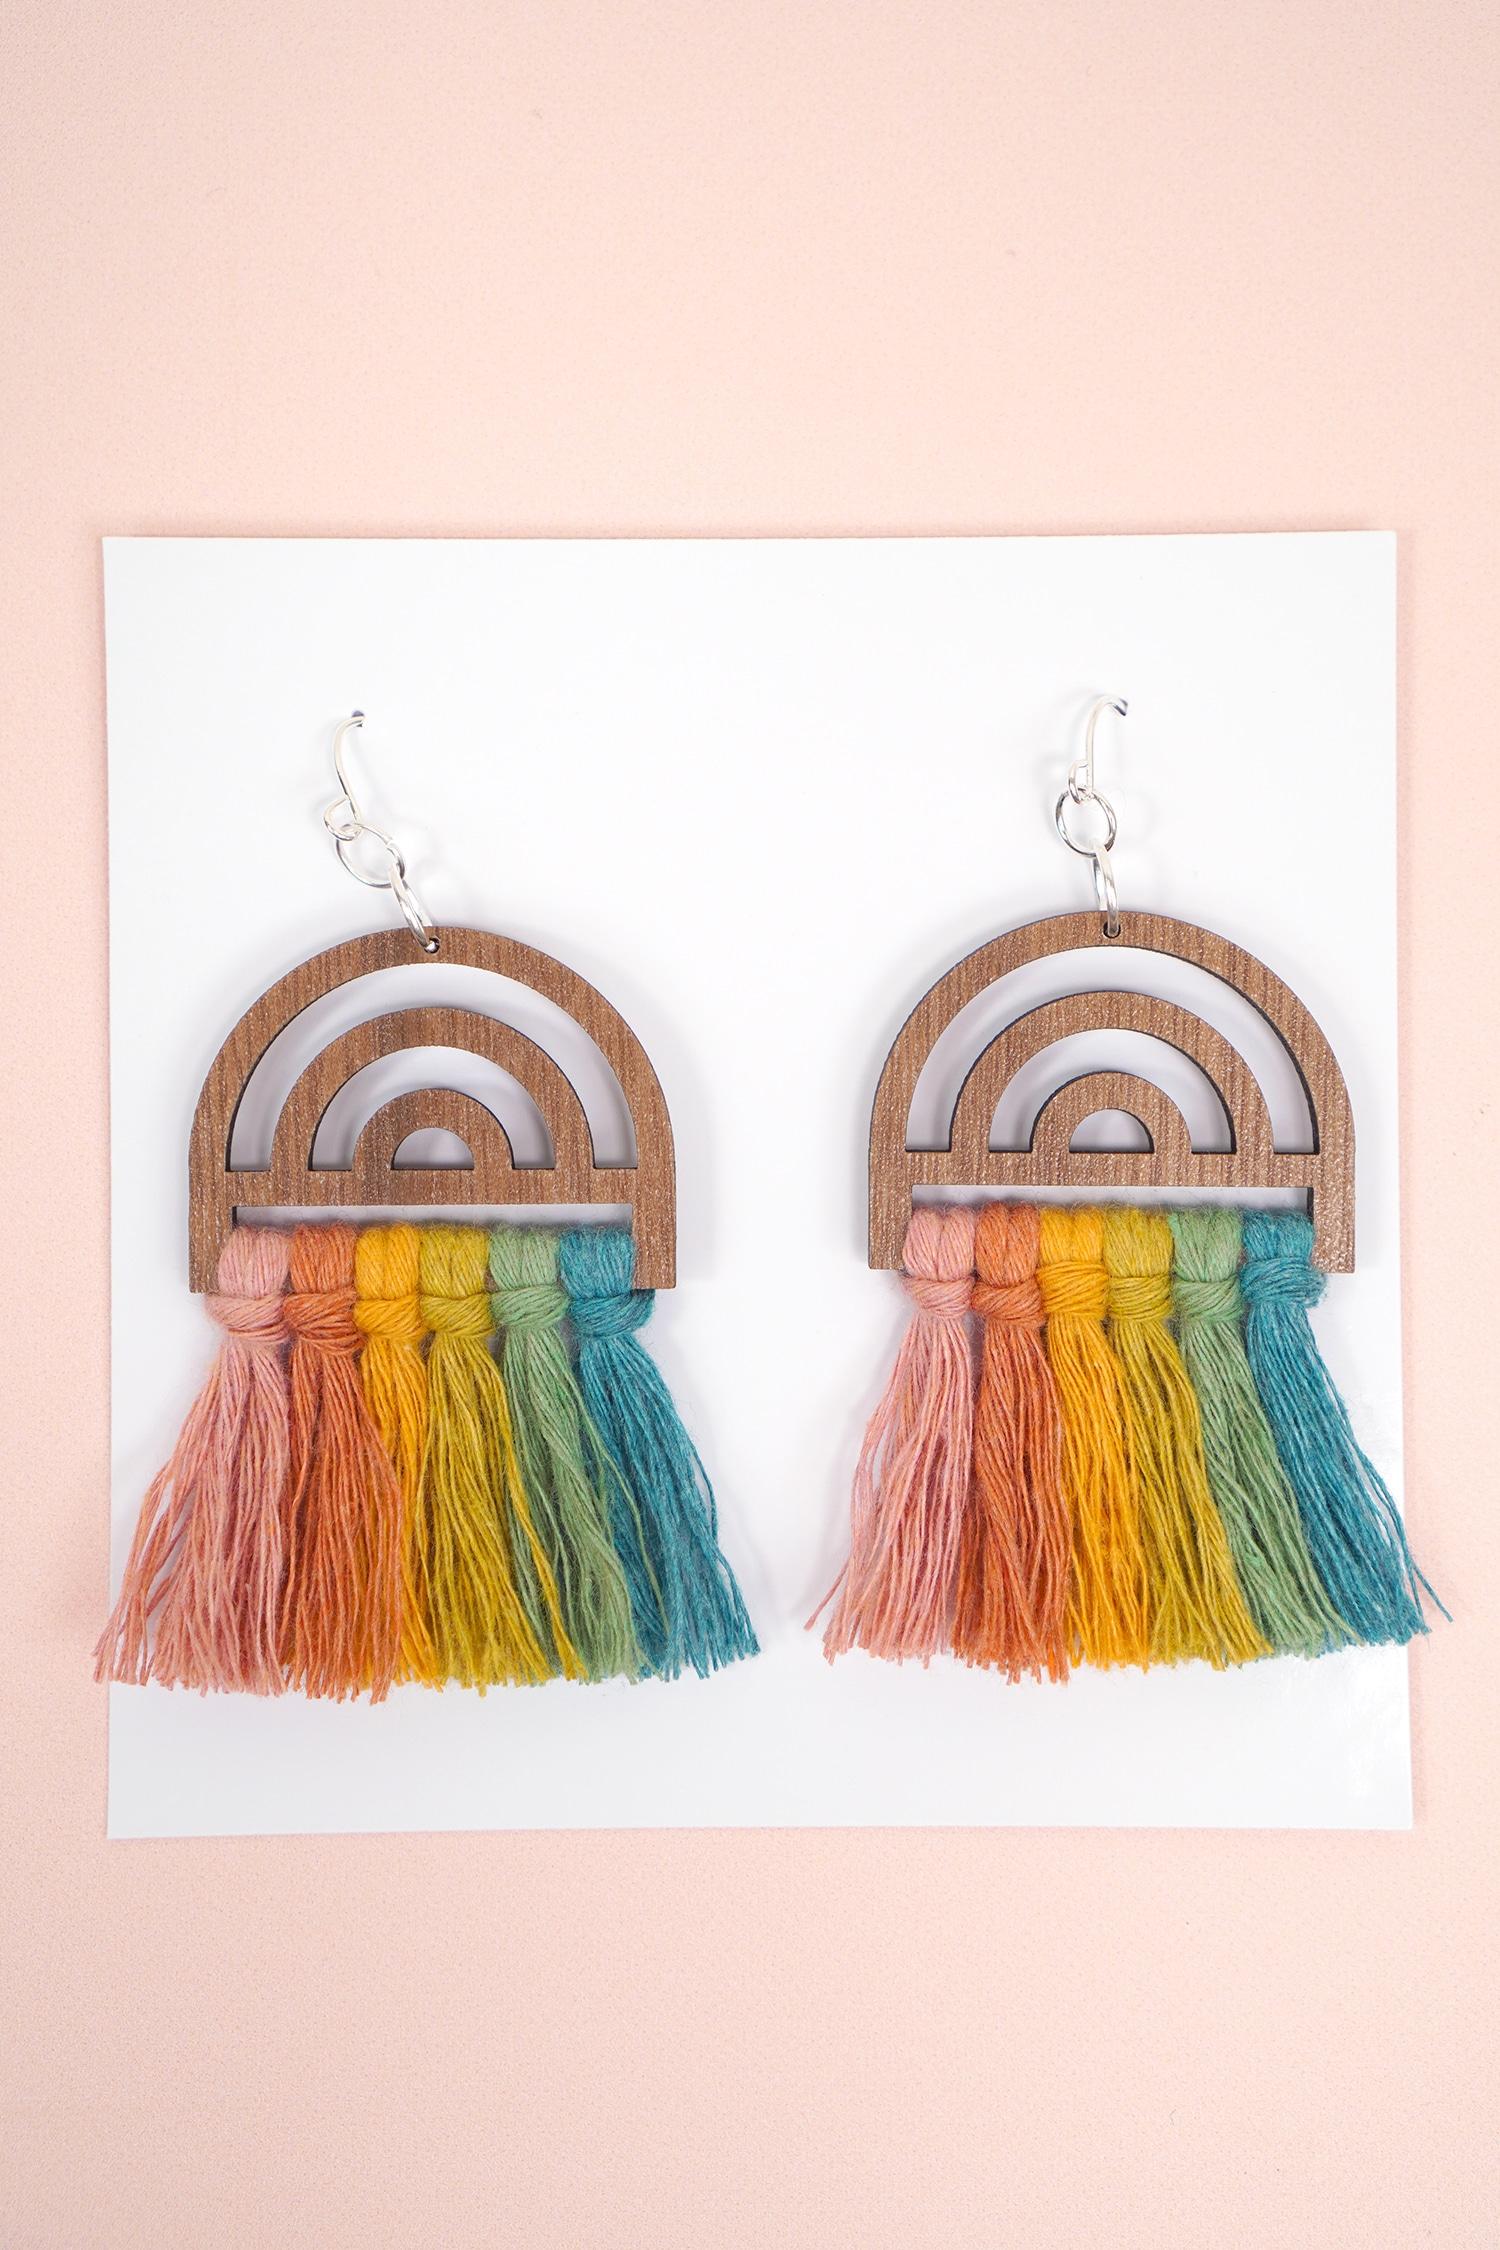 Wooden Rainbow Macrame Earrings on Peach Background